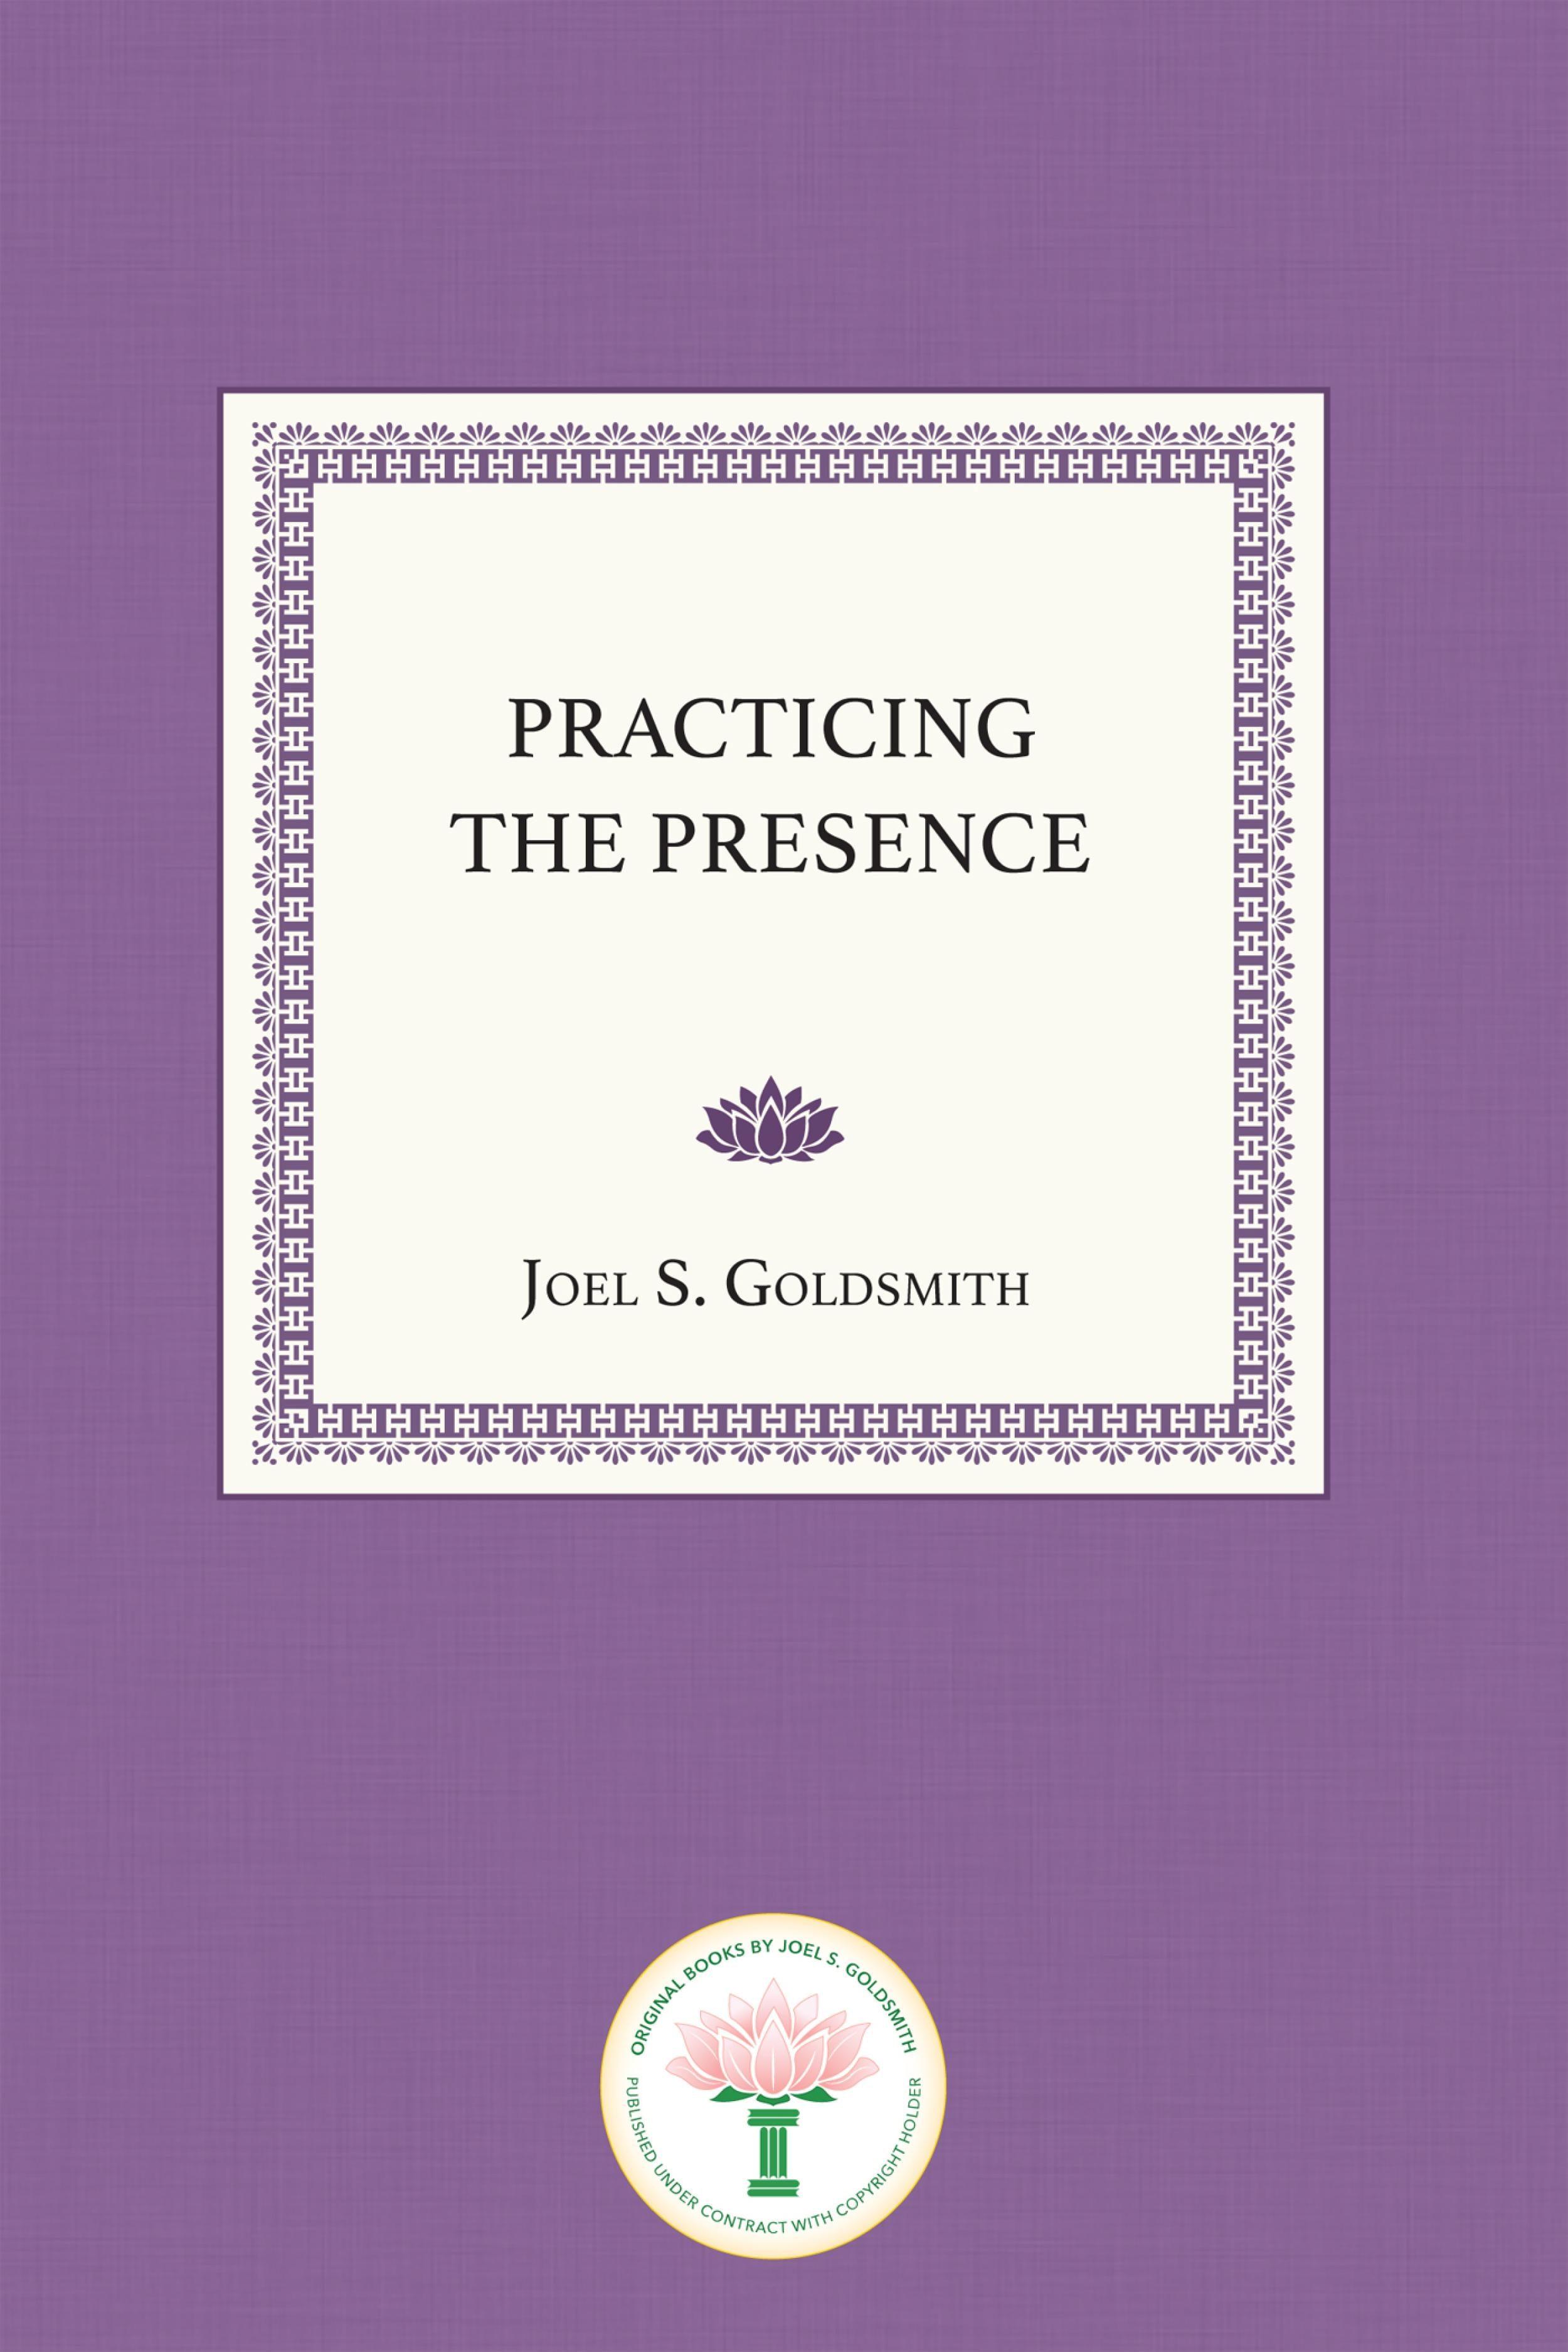 Practicing the presence ebook joel s goldsmith 9781939542250